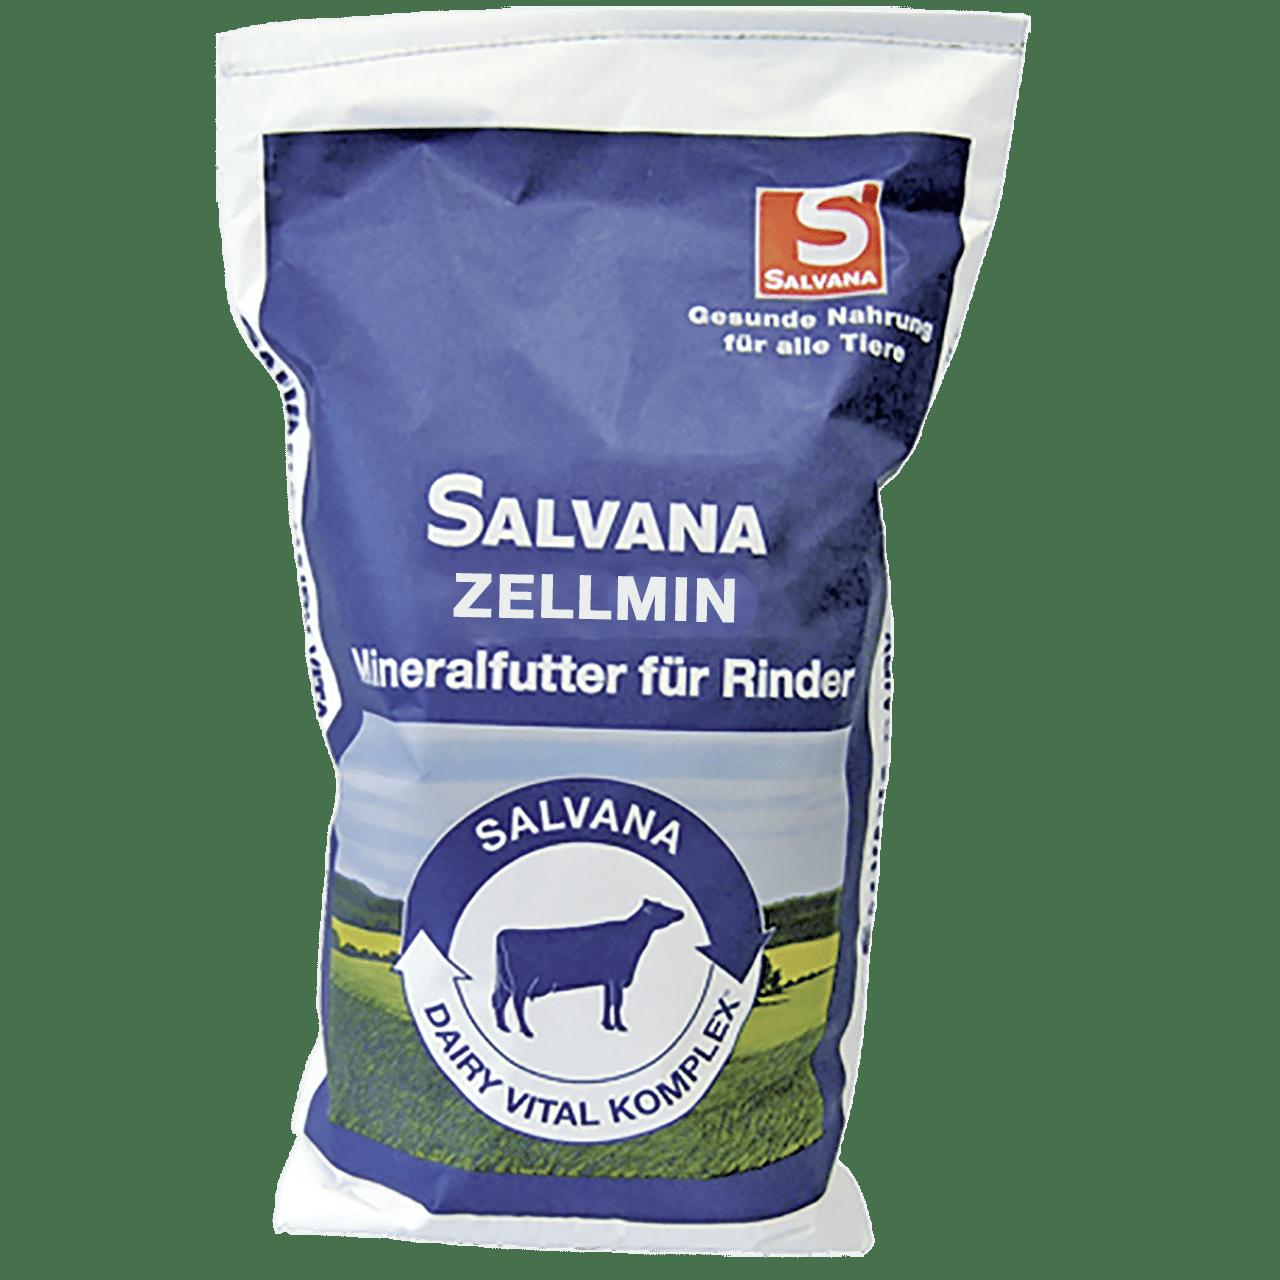 SALVANA ZELLmin